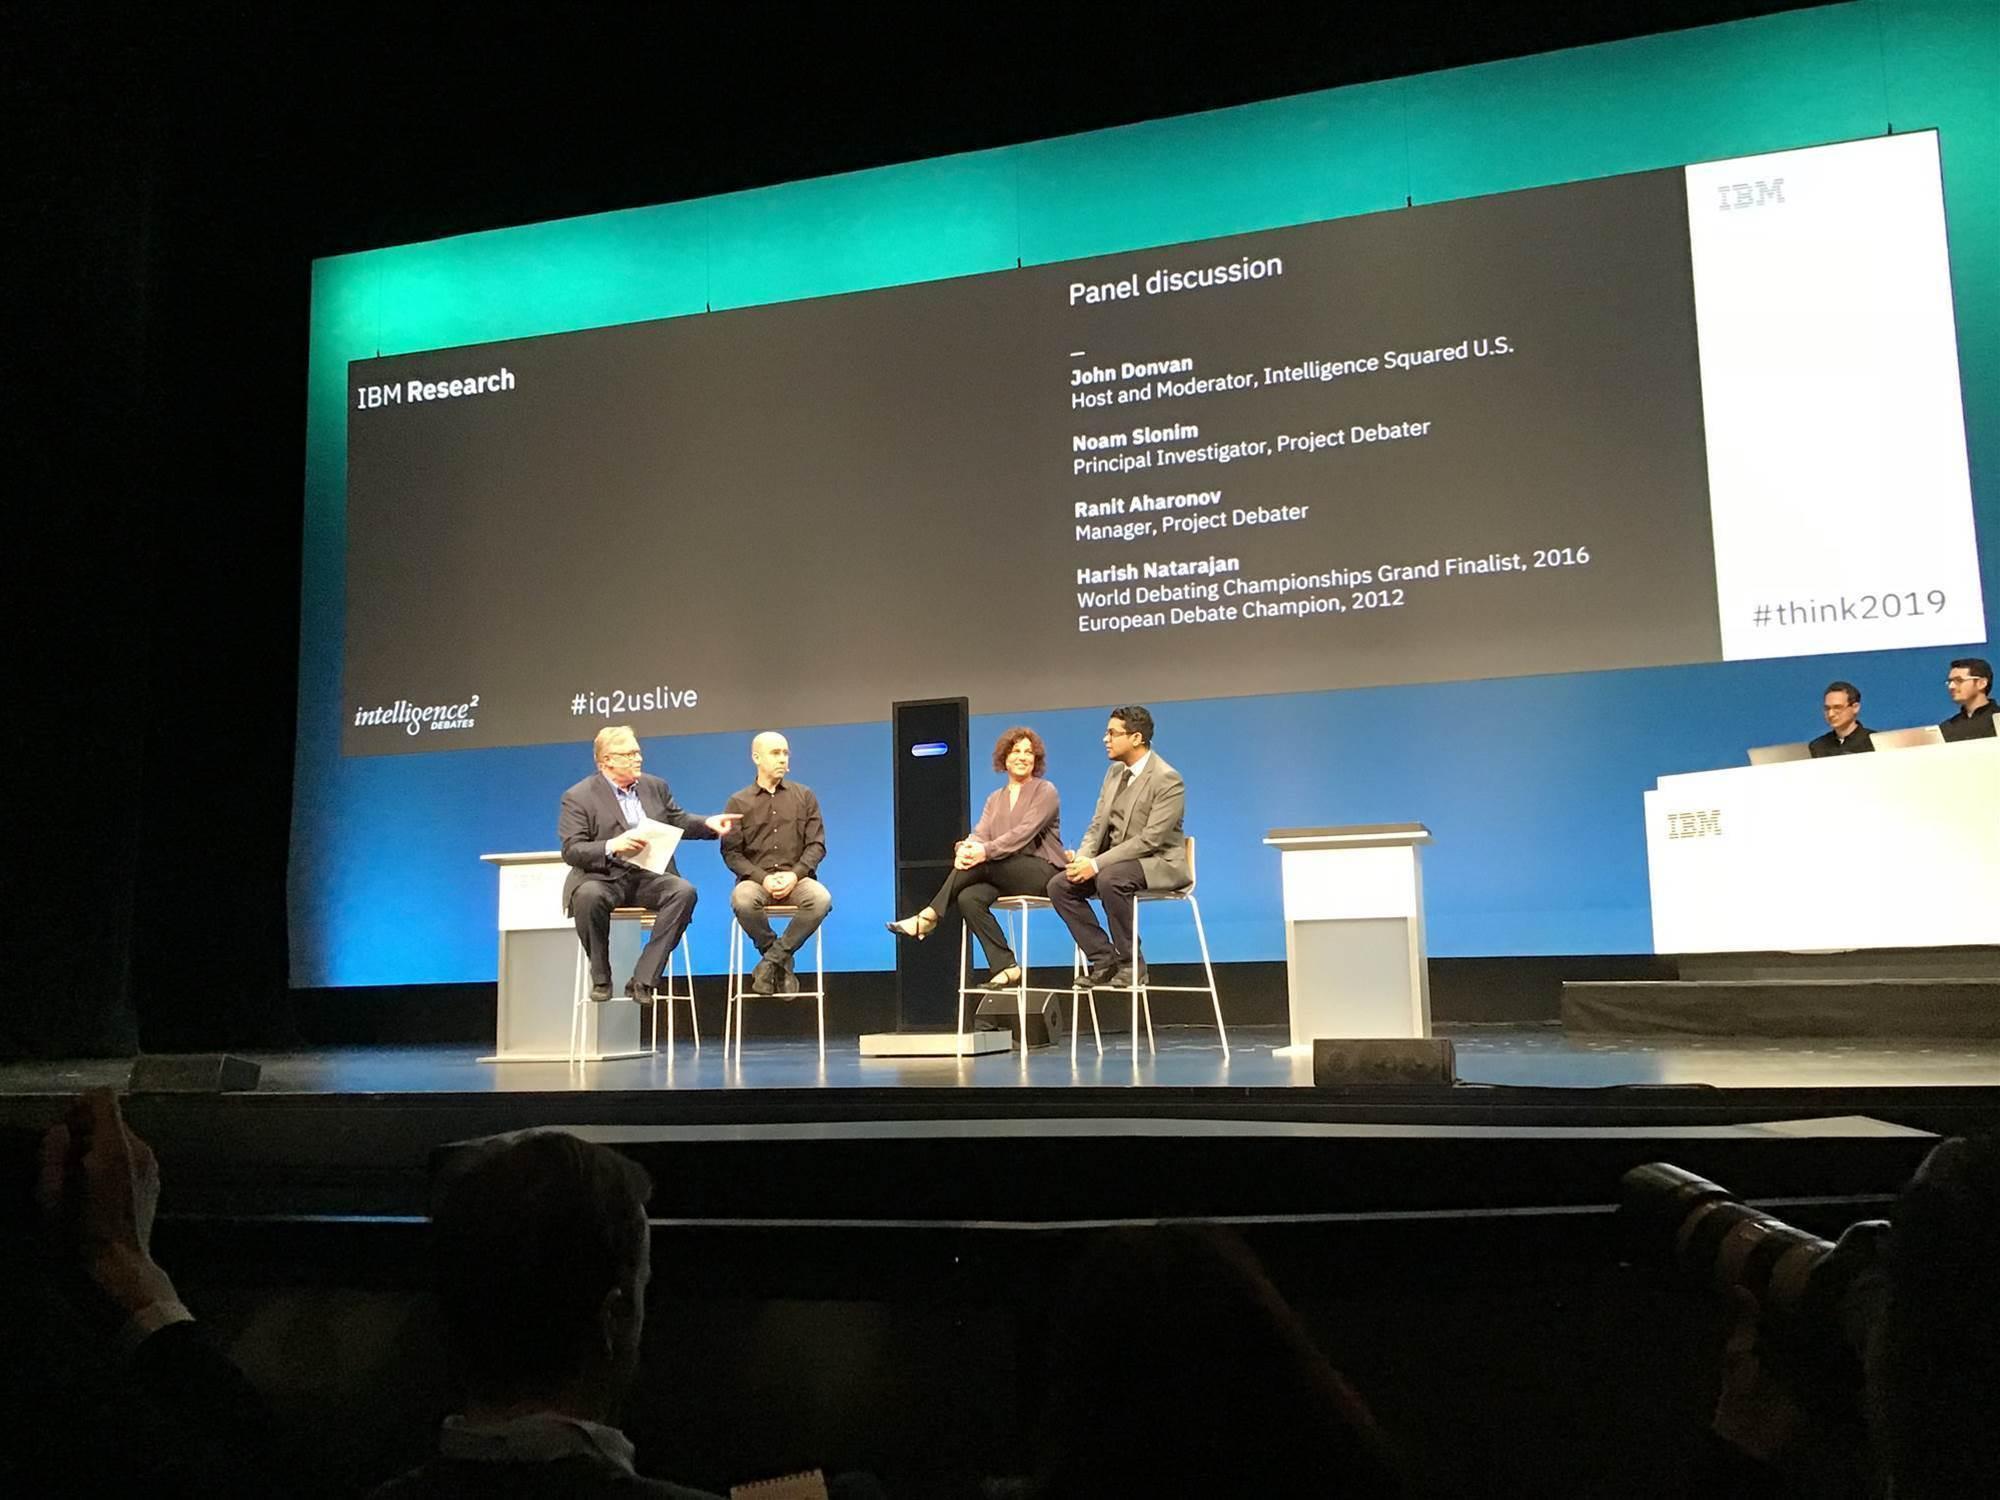 IBM's Project Debater loses live debate to human champion